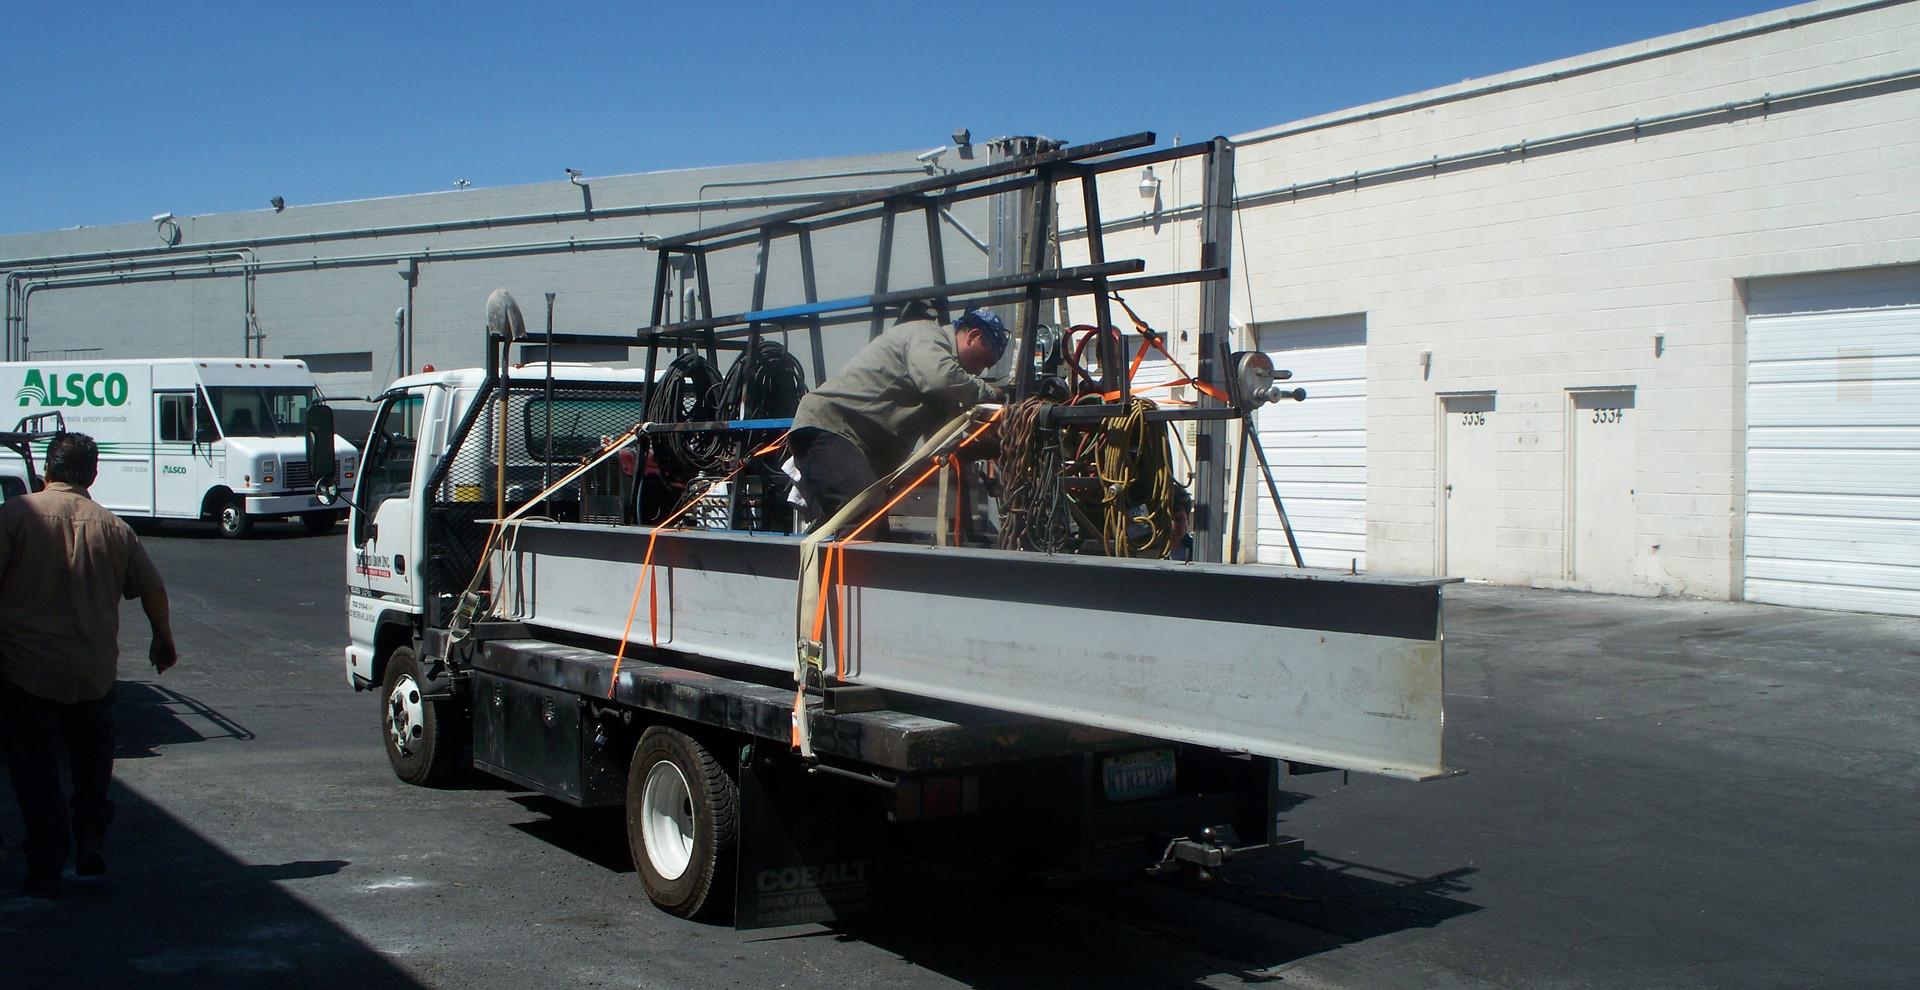 Main Home Beam Las Vegas - Intrepid Metal Works Inc.